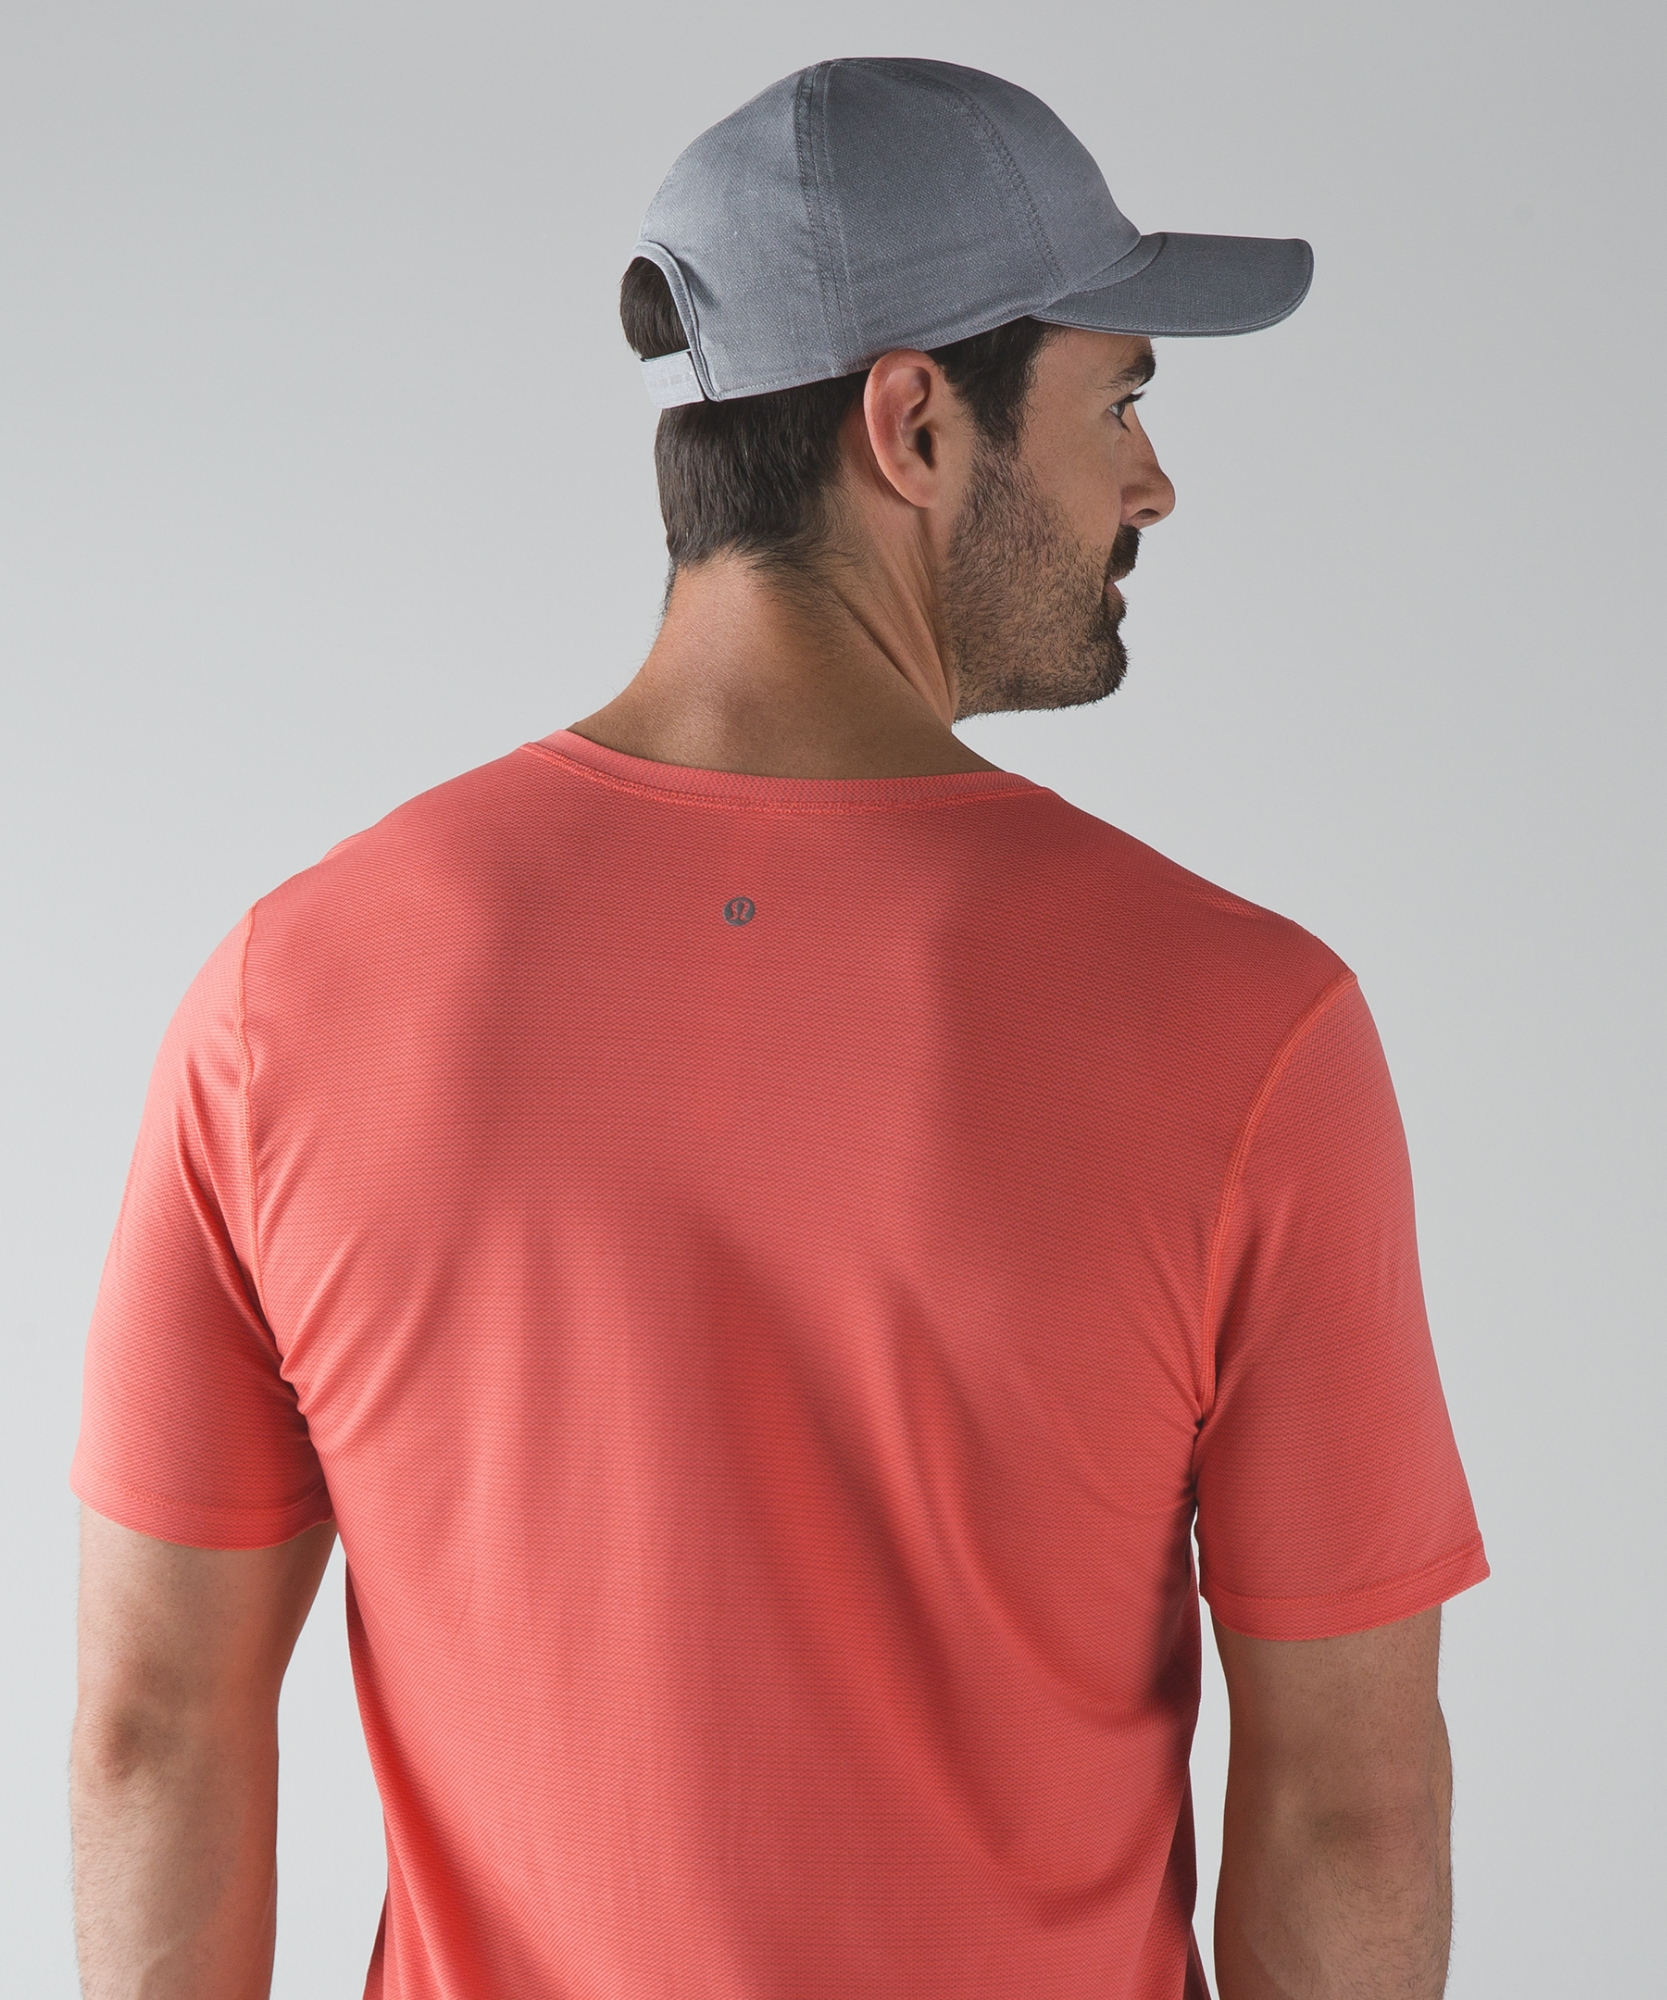 a50dc215aa5fd lululemon athletica - Multicolor Lightspeed Run Hat for Men - Lyst